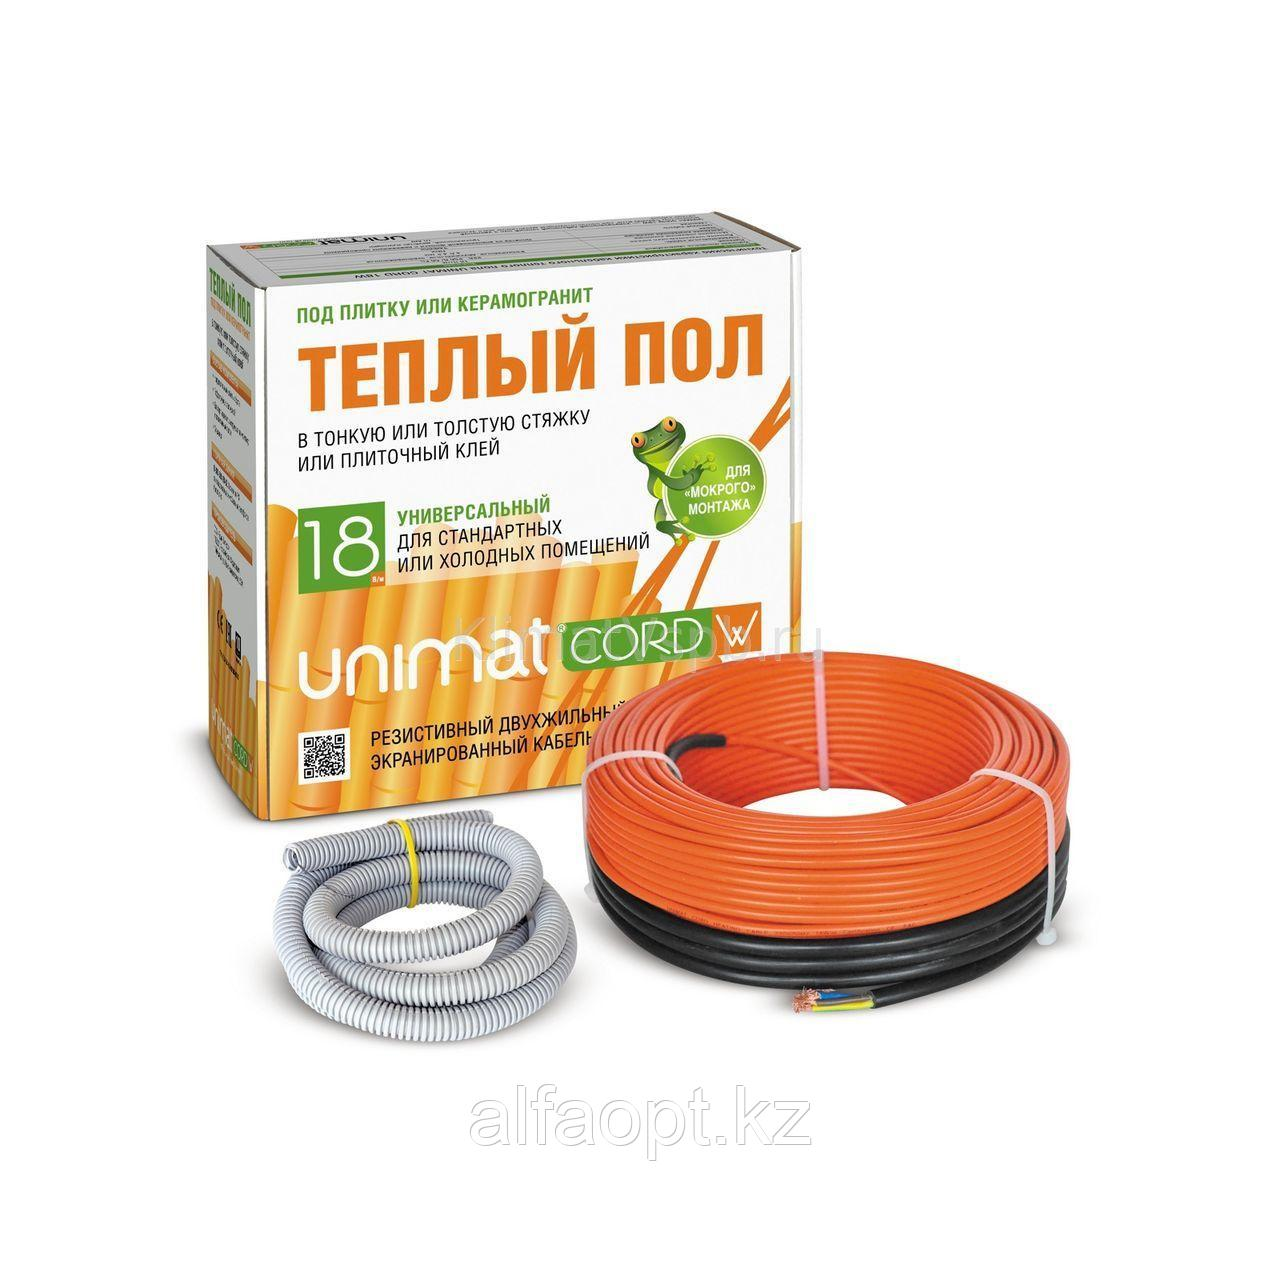 Комплект теплого пола Unimat CORD 18W-50